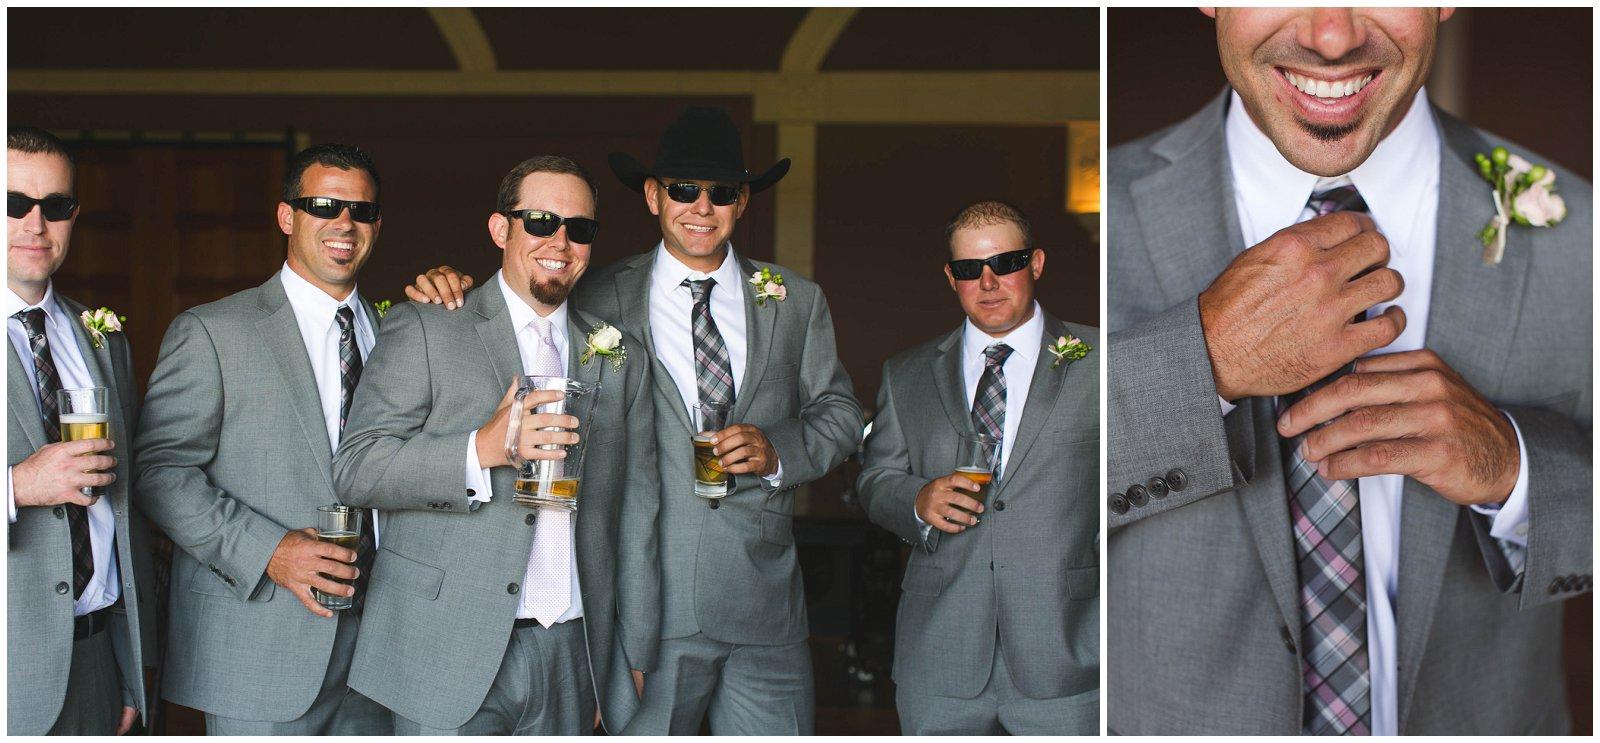 San-Francisco-Bay-Area-Wedding-Photography-Casa-Real-8.jpg